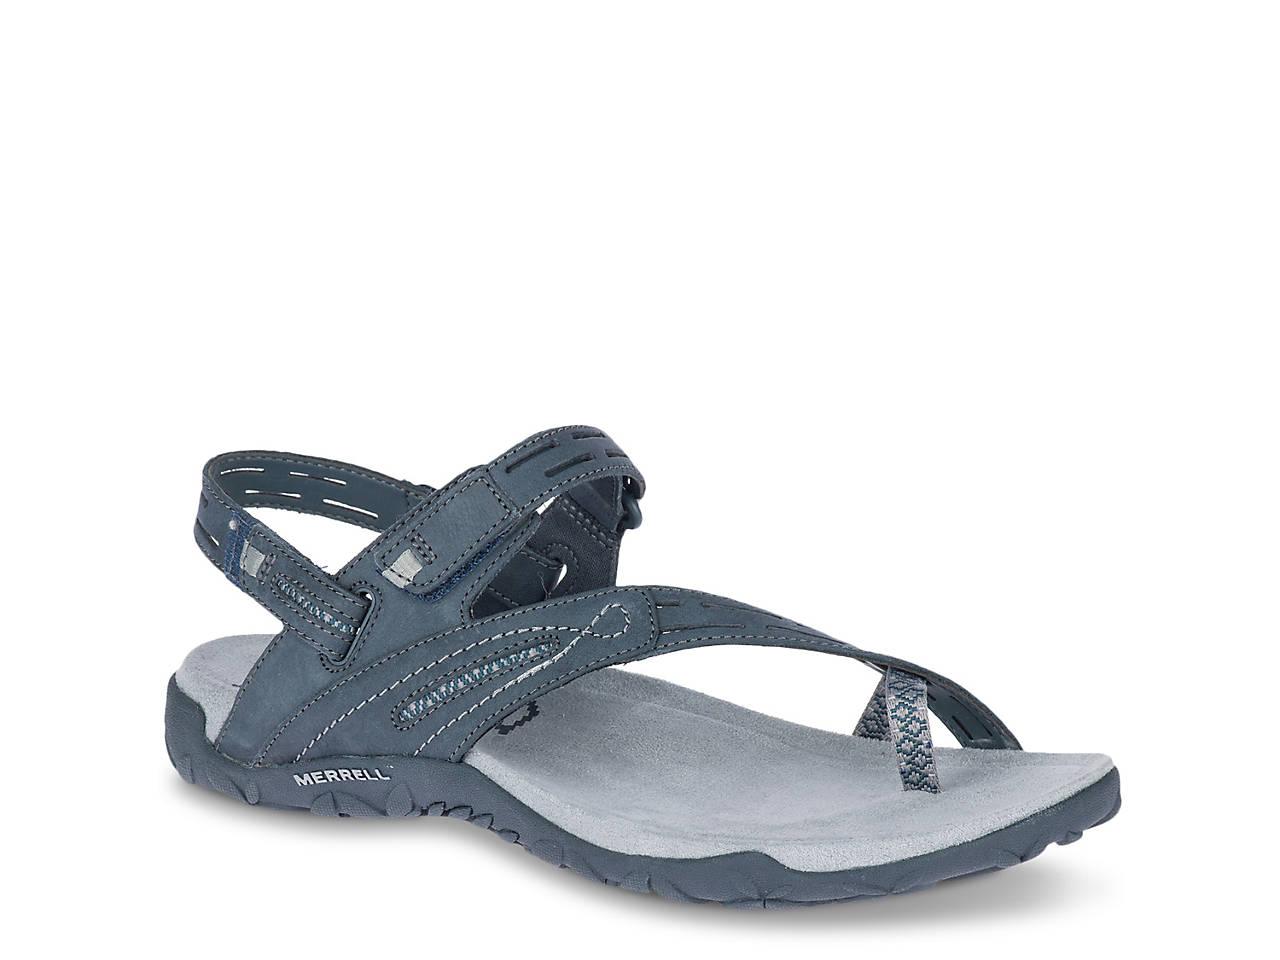 5653039e22cf Merrell Terran Convertible II Sandal Women s Shoes